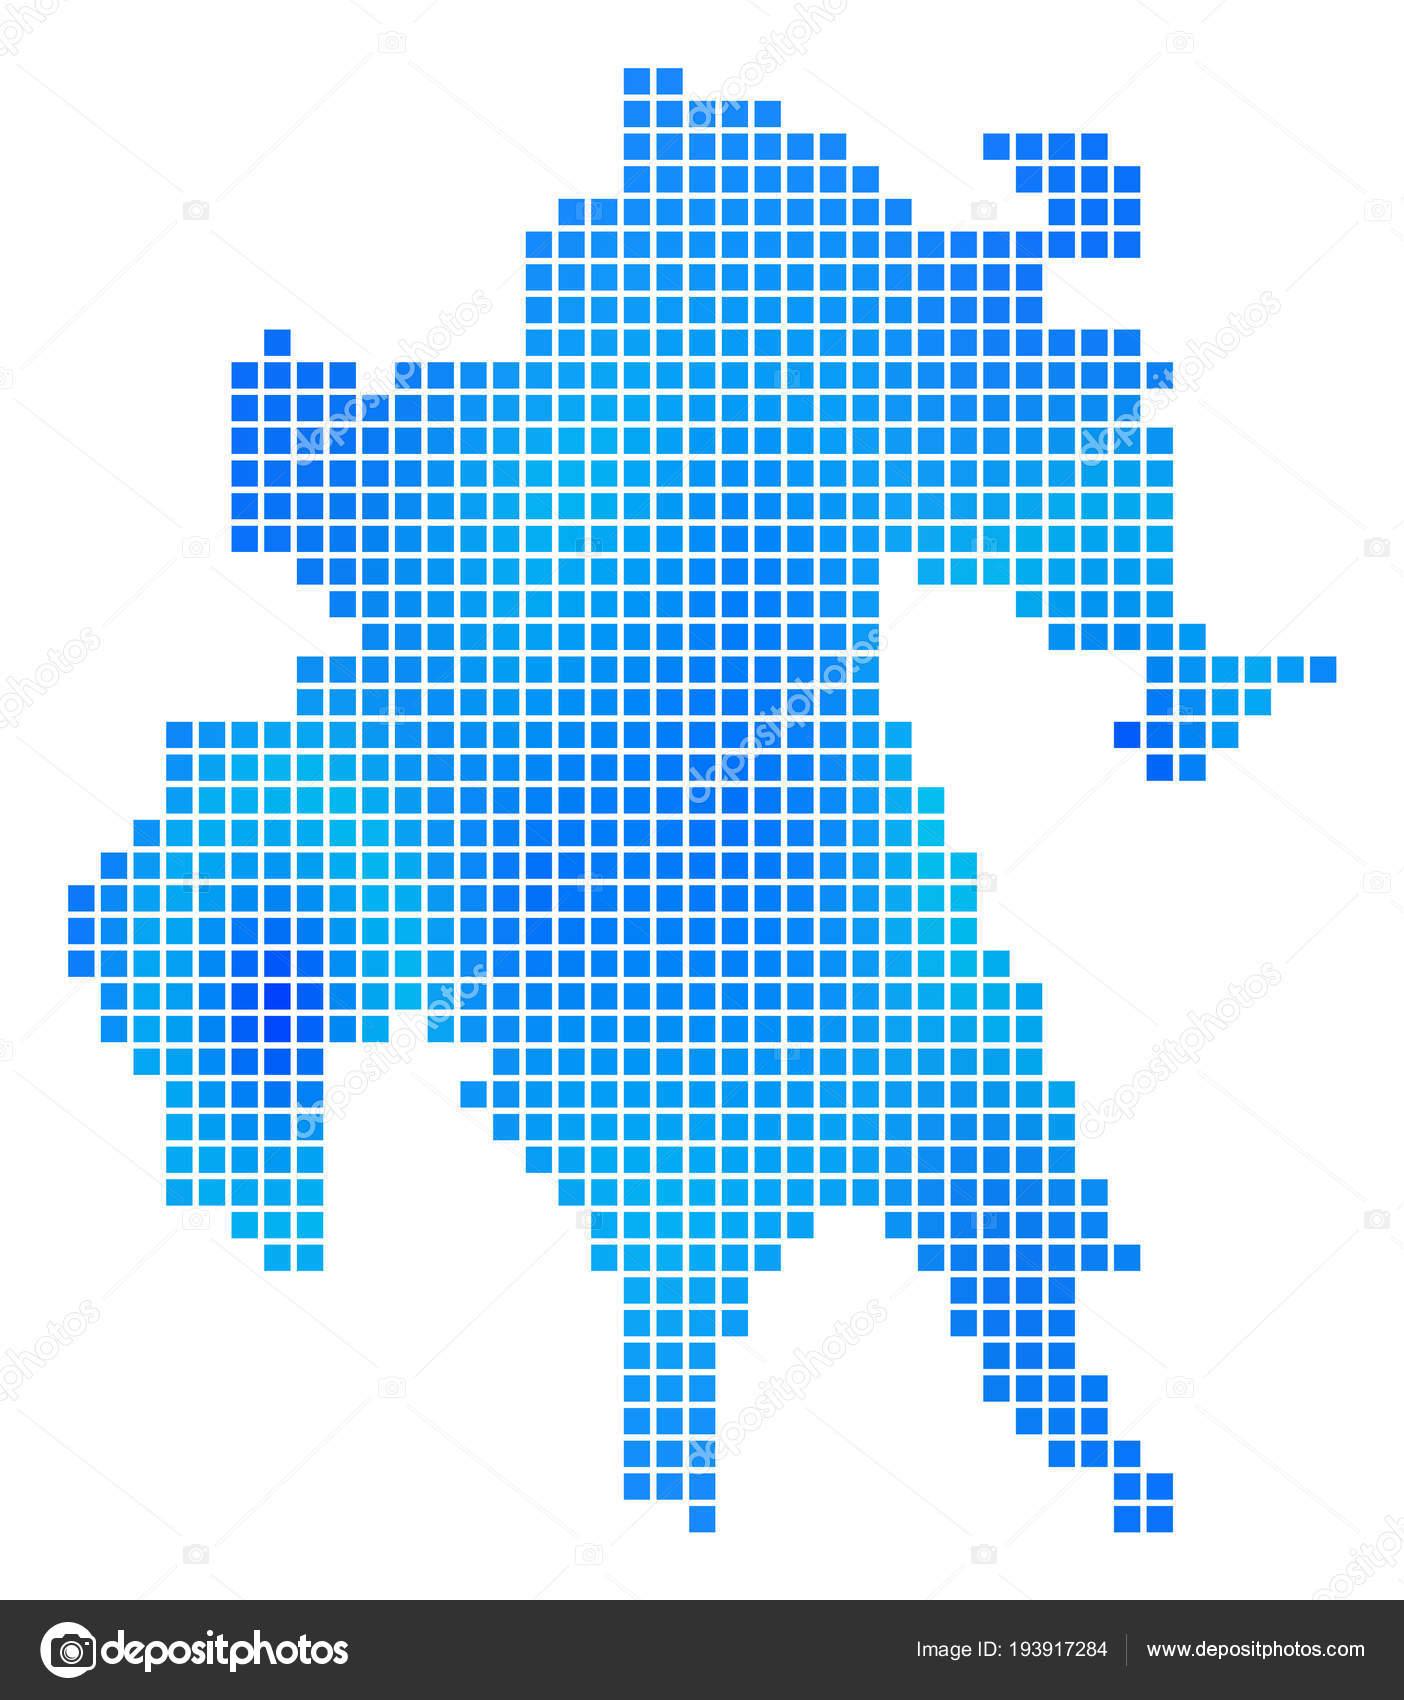 Peloponnes Karte Regionen.Blauer Punkt Peloponnes Halbinsel Karte Stockvektor Ahasoft